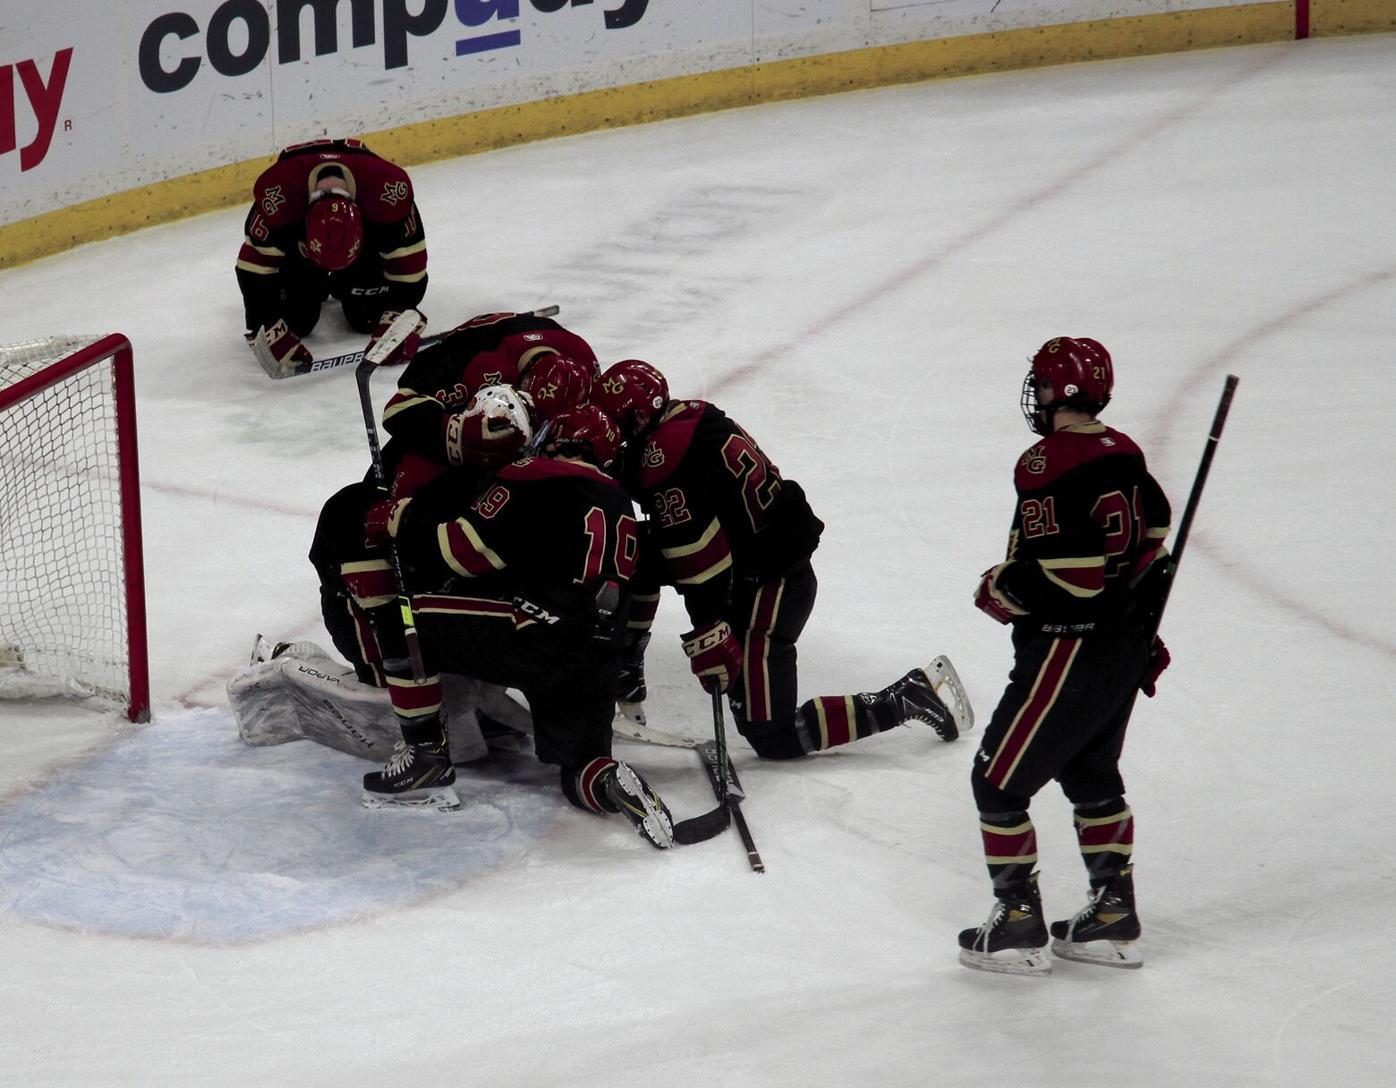 UPDATED: Eagles top Crimson boys hockey 6-5 in OT thriller